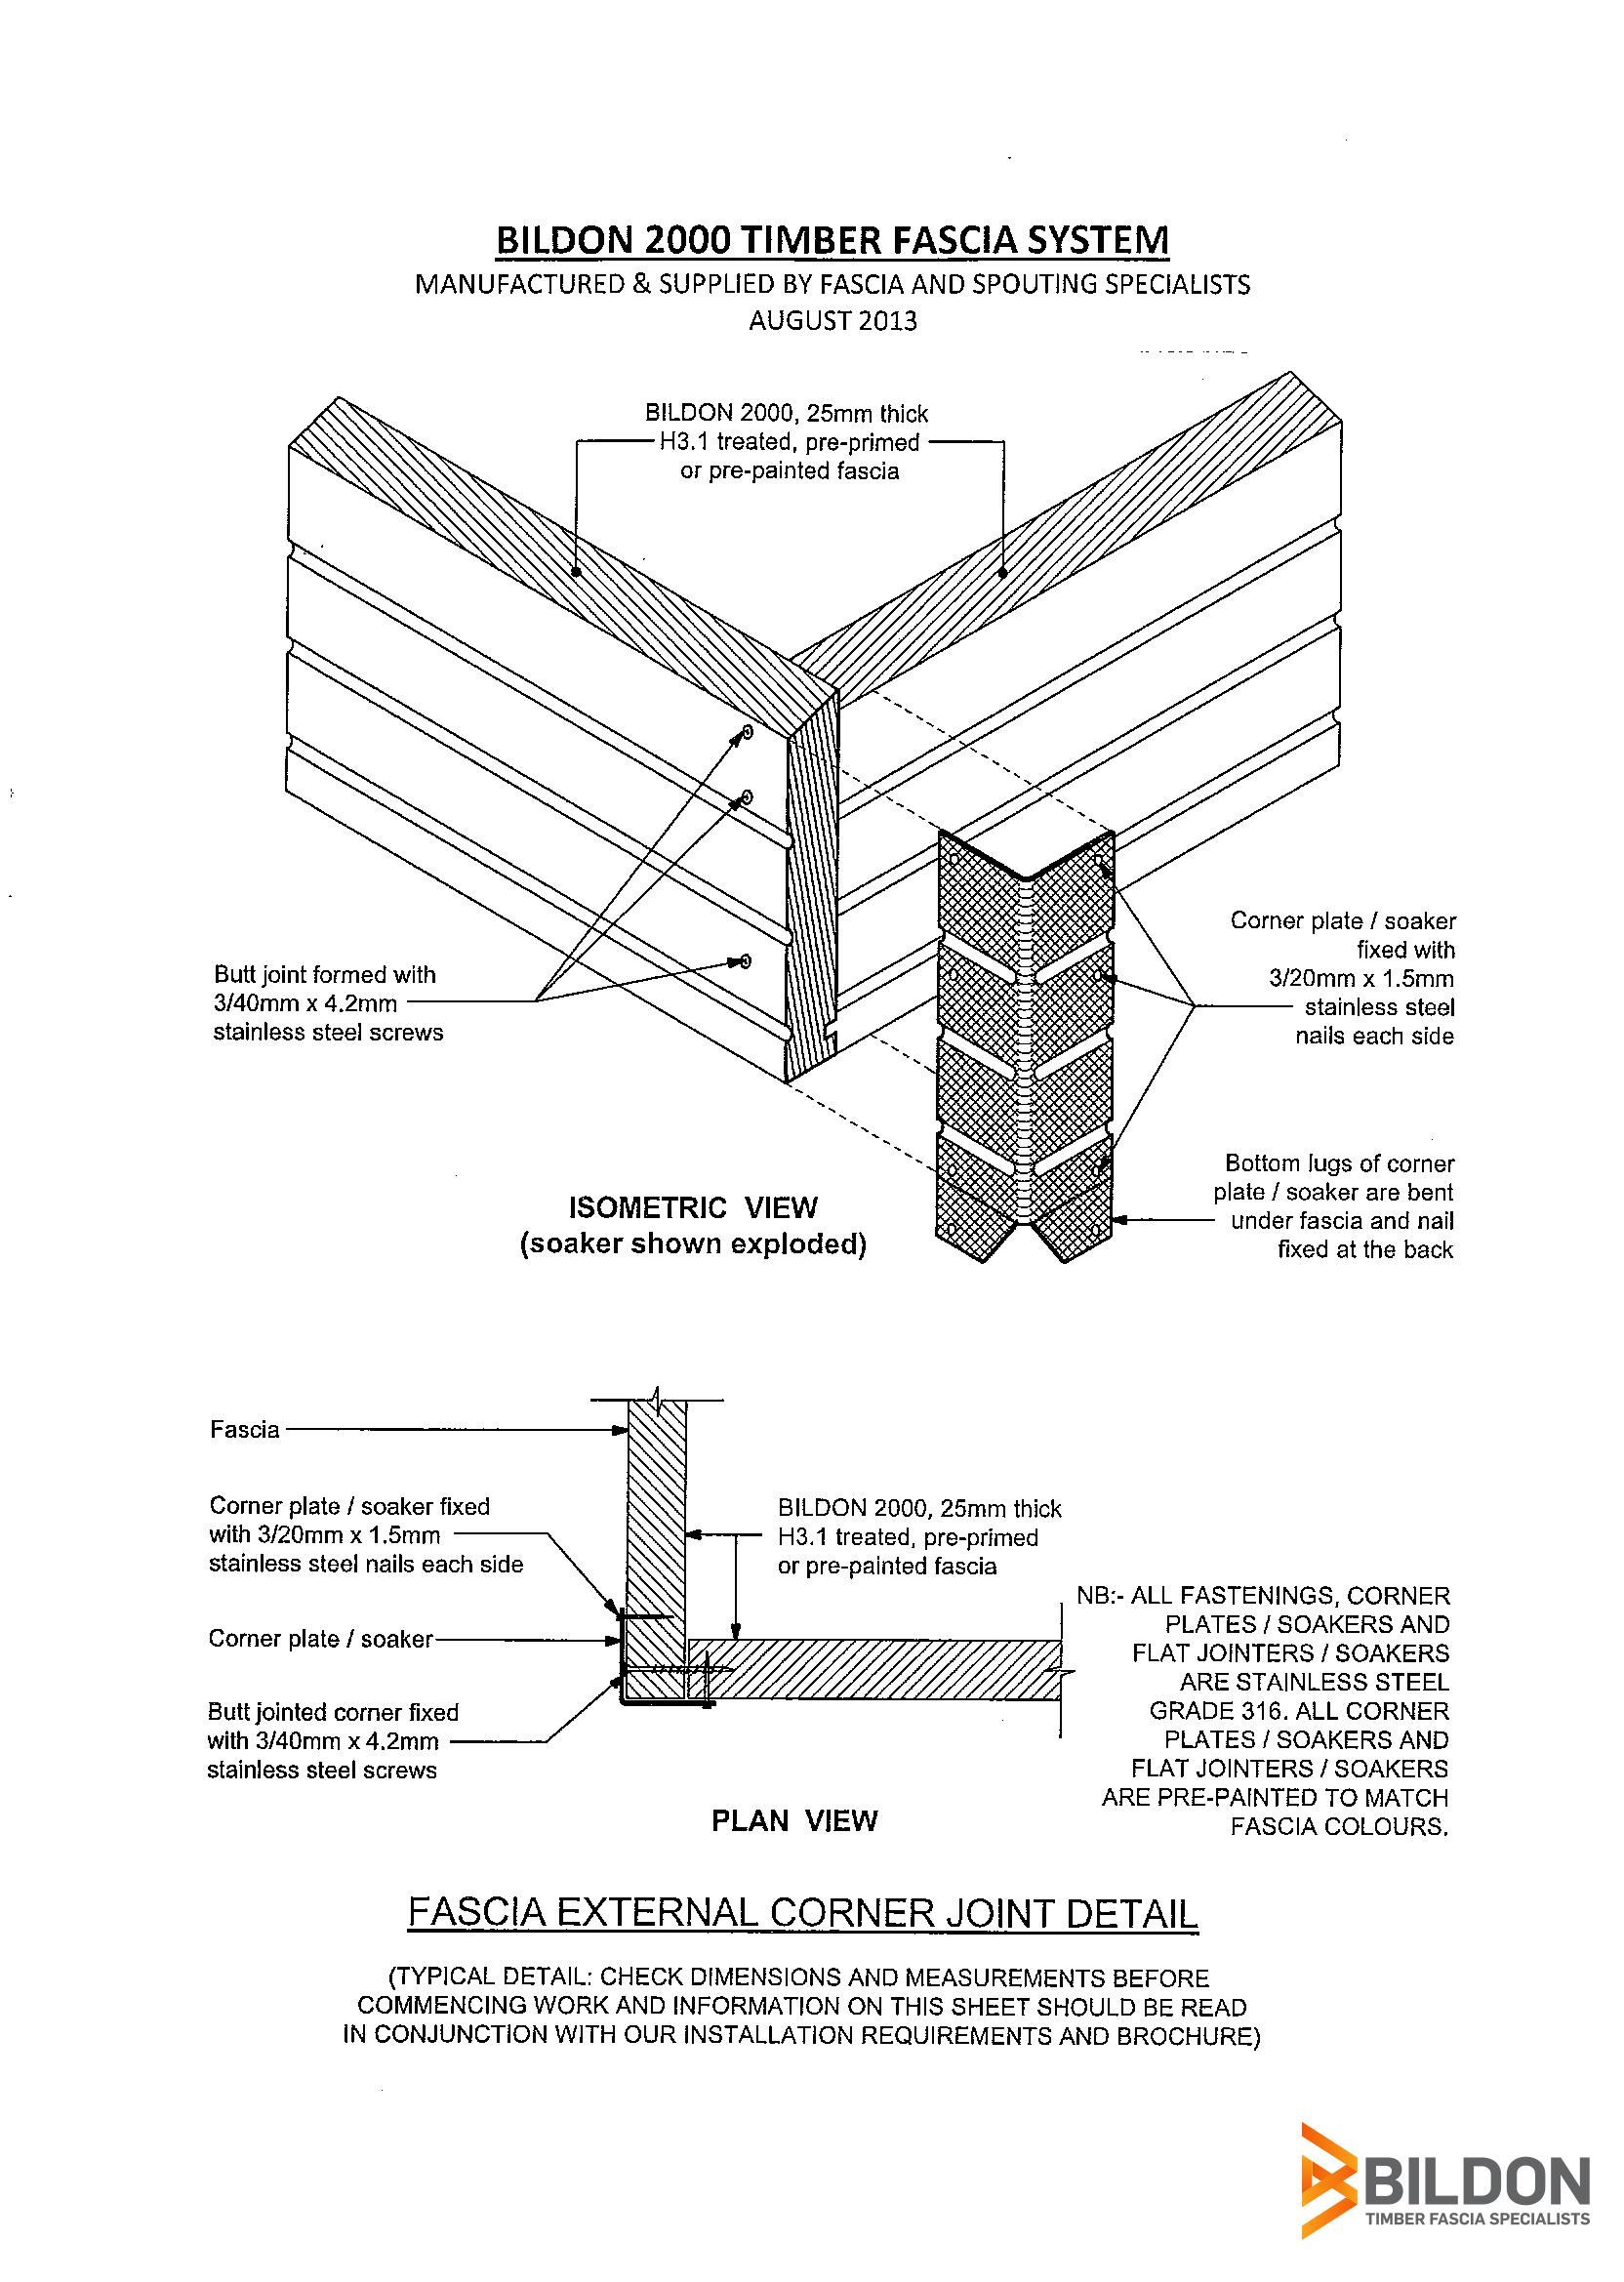 Fascia External Corner Joint Detail.jpg